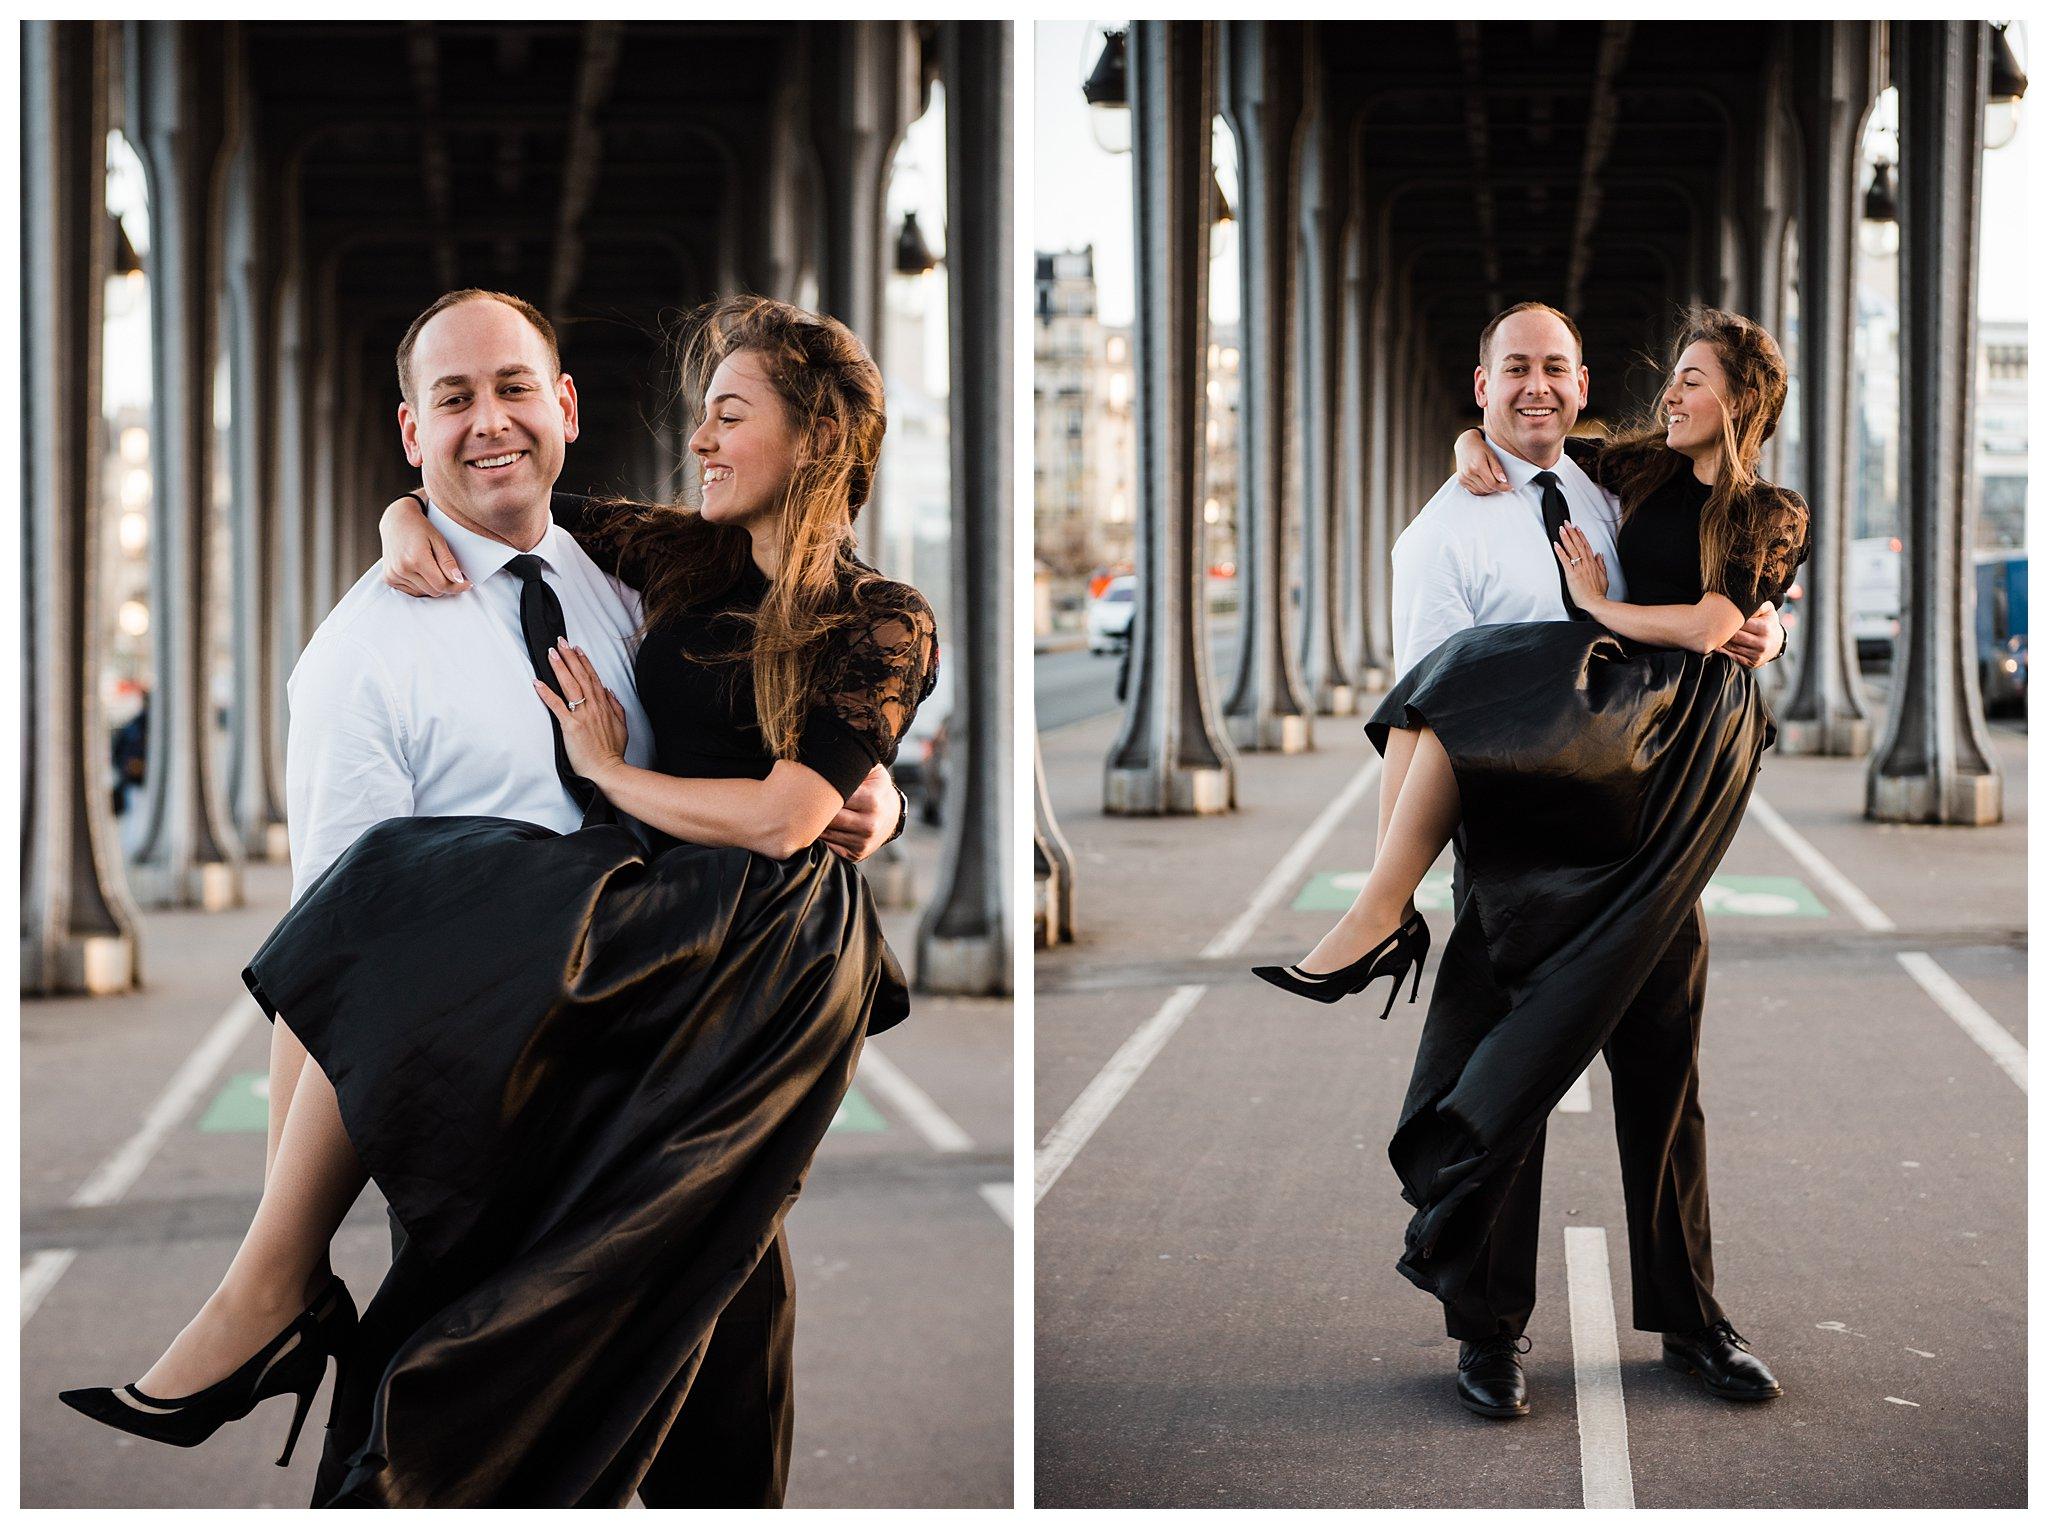 Jennifer and Yannick's Surprise Paris Proposal Photo Shoot at the Eiffel Tower - he picks her up at the bir-hakeim bridge